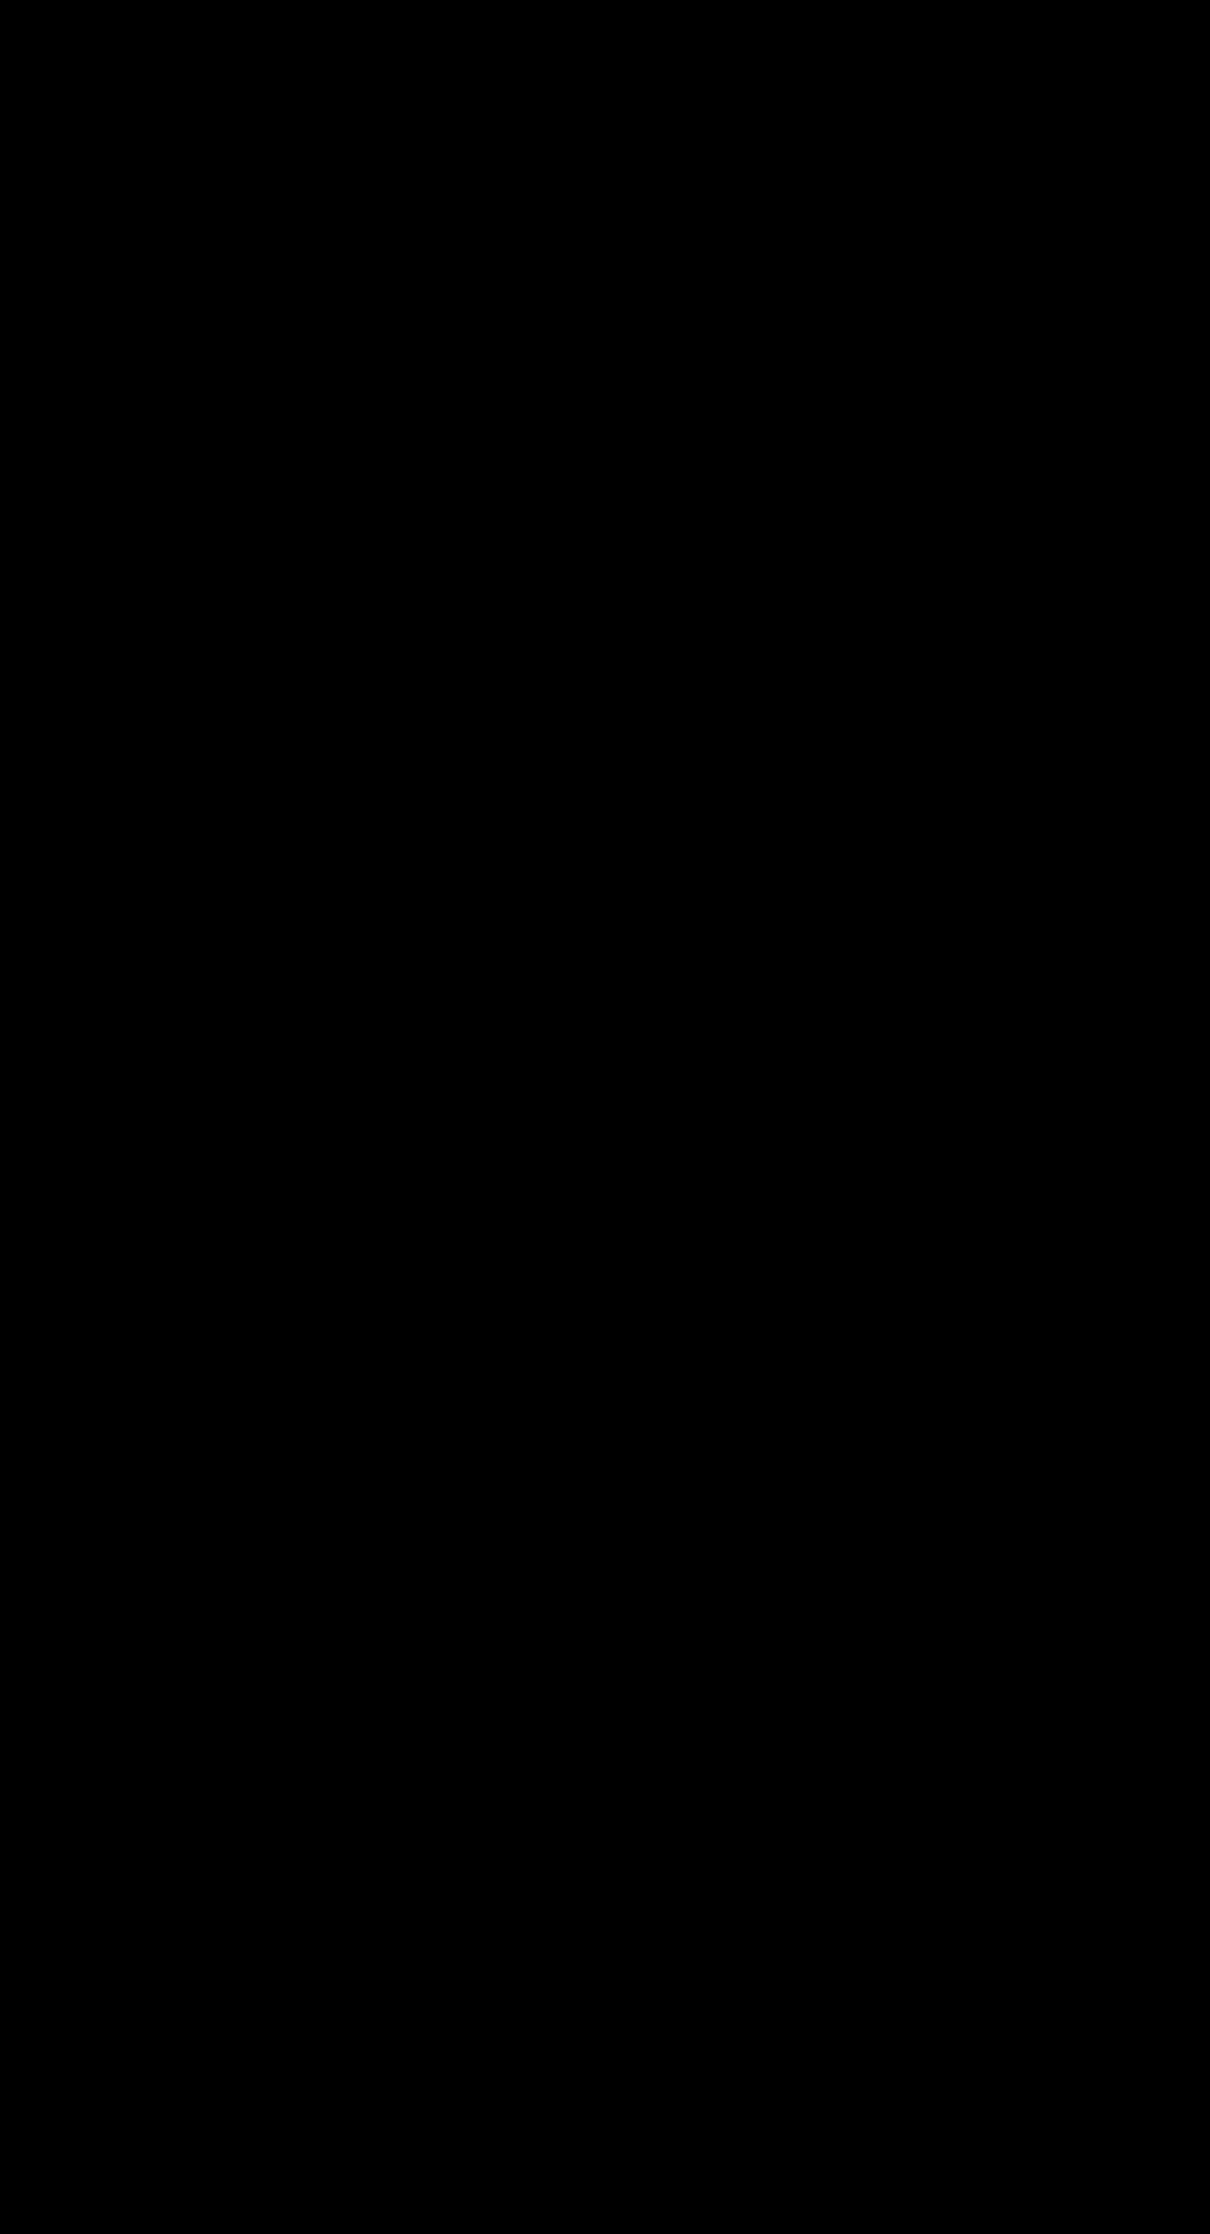 1210x2234 Clip Art Boy Silhouette Clip Art